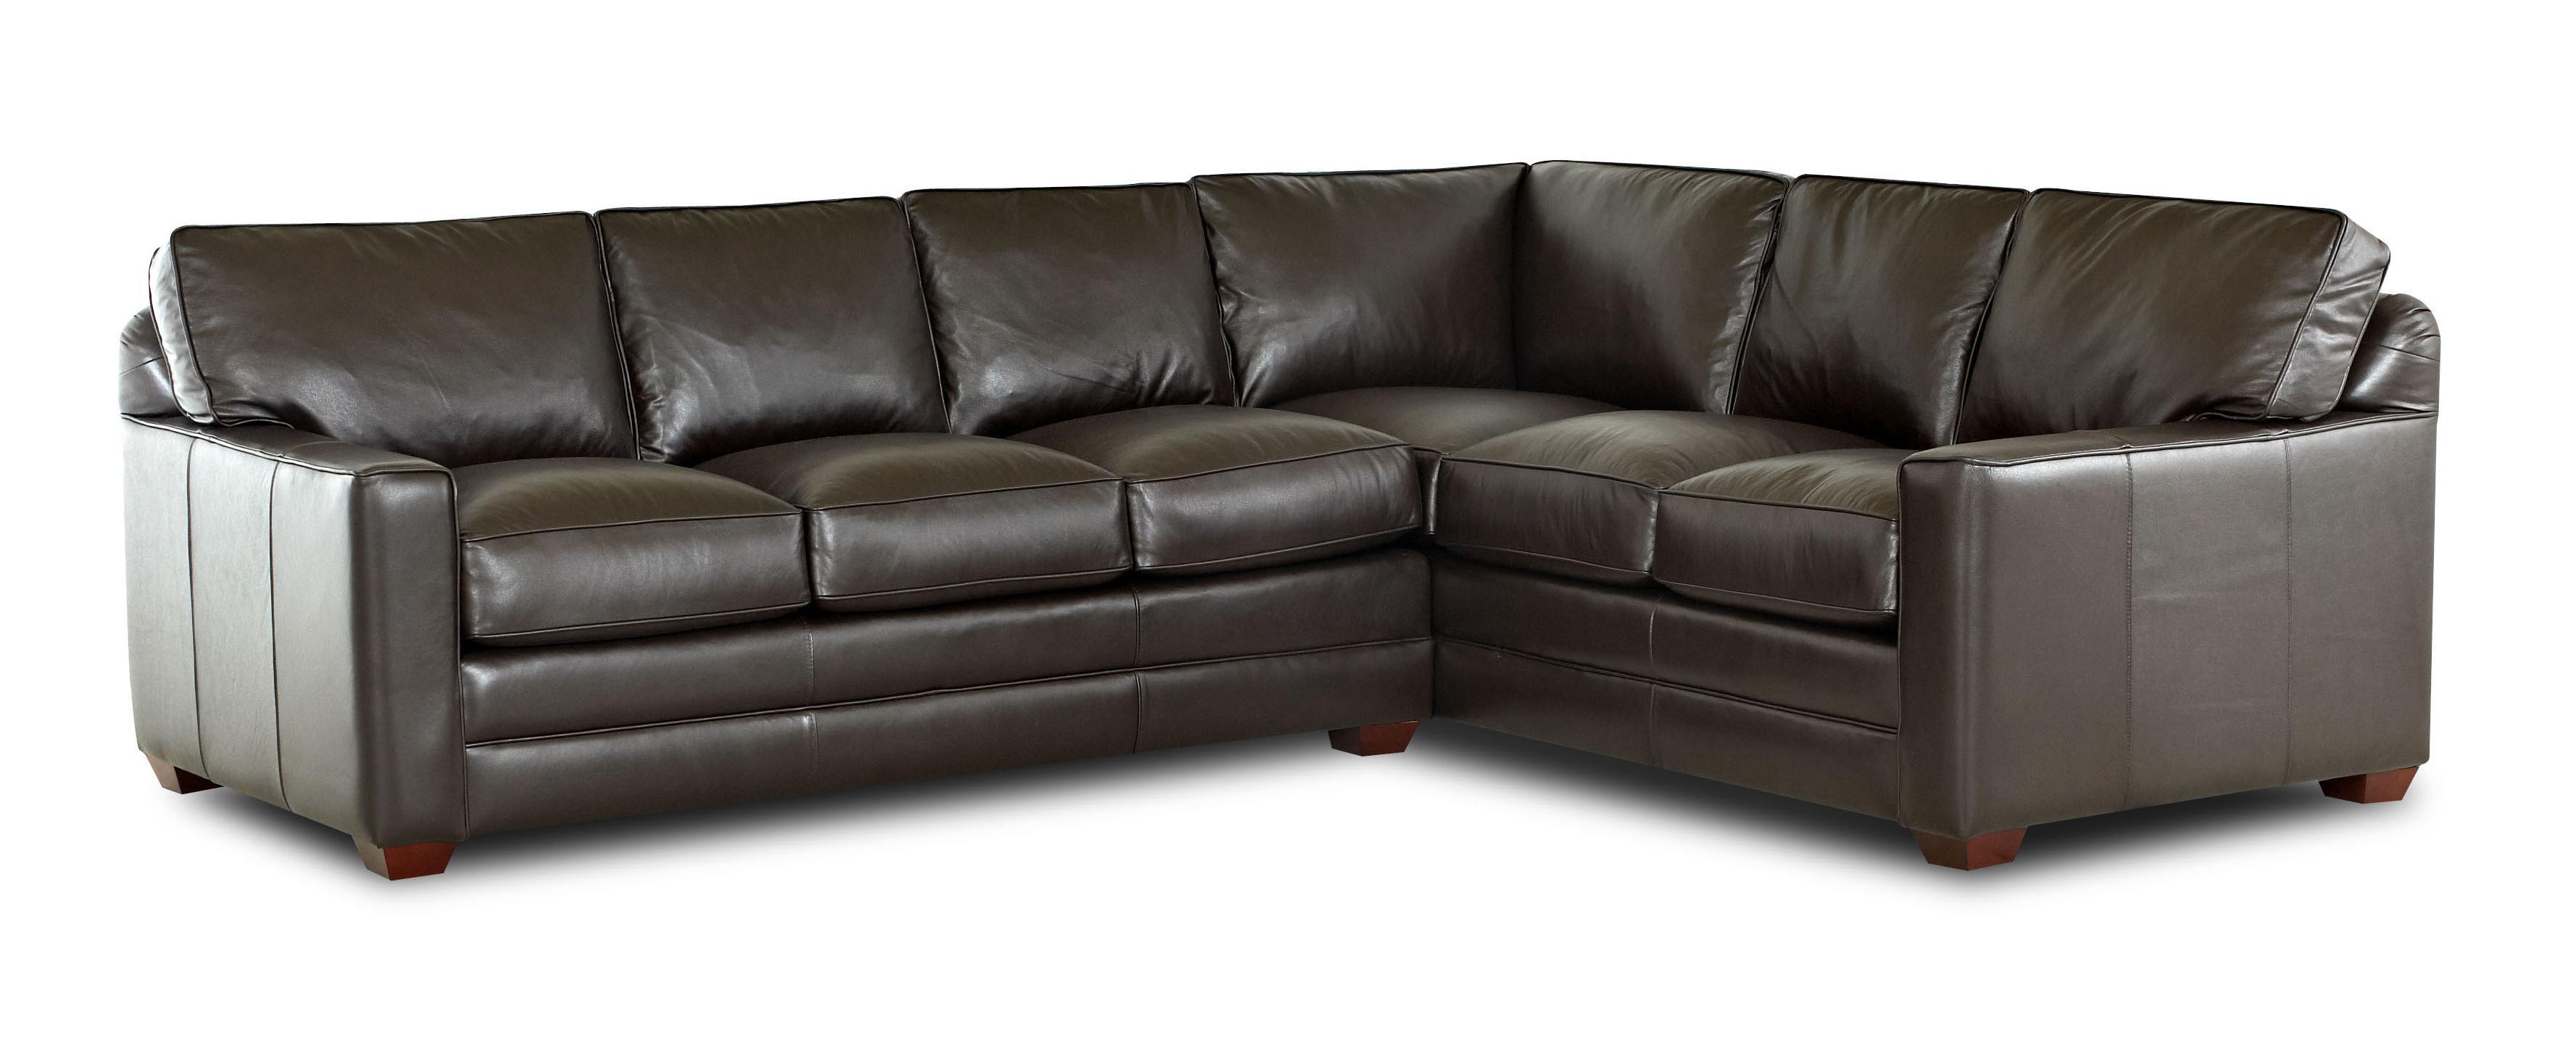 2 Piece Sectional Sofa with RAF Corner Sofa